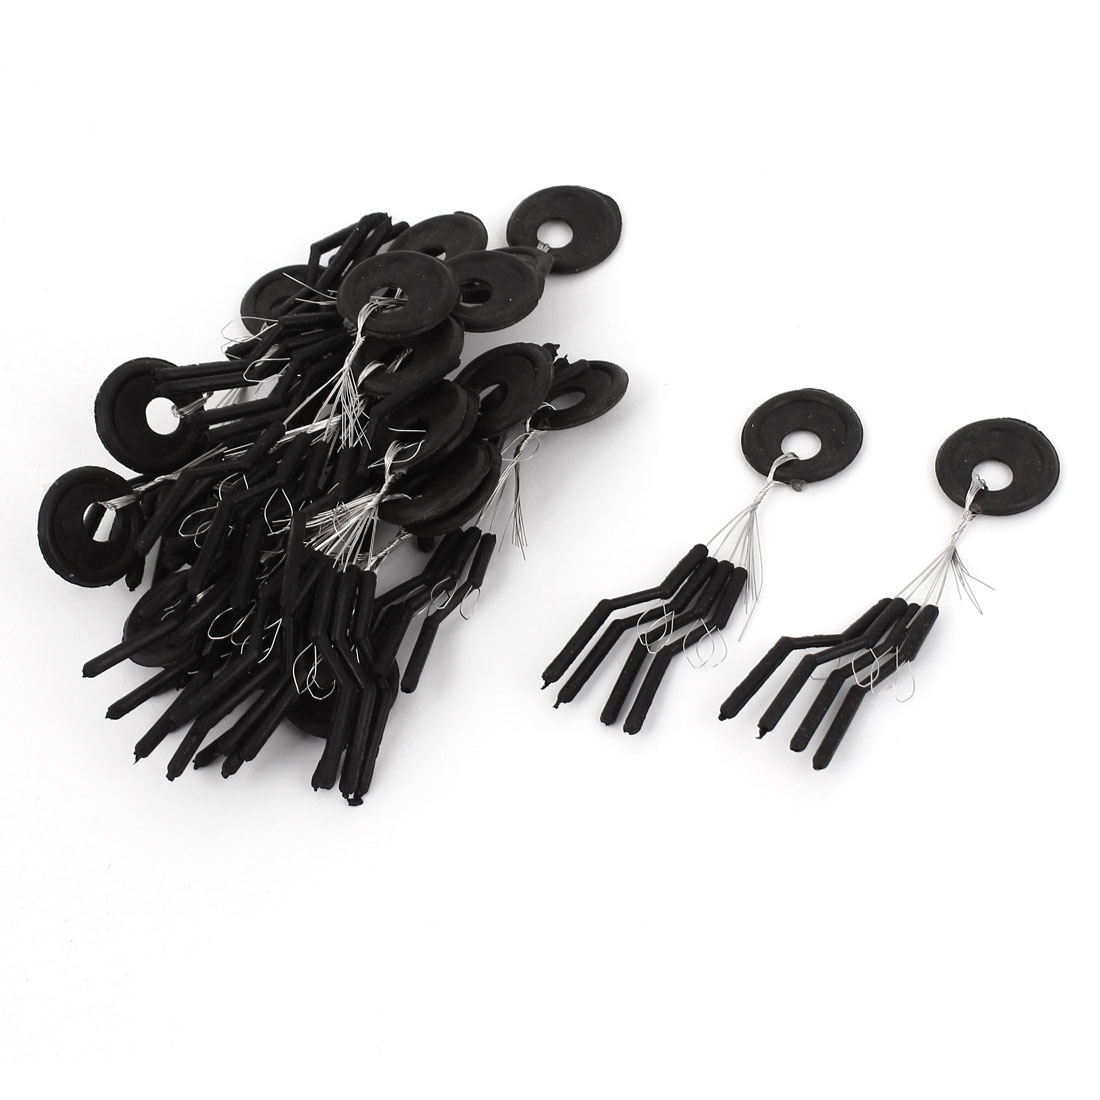 Unique Bargains 20 Pcs Black Plastic Ring Cylindrical Float Fishing Bobber Stopper by